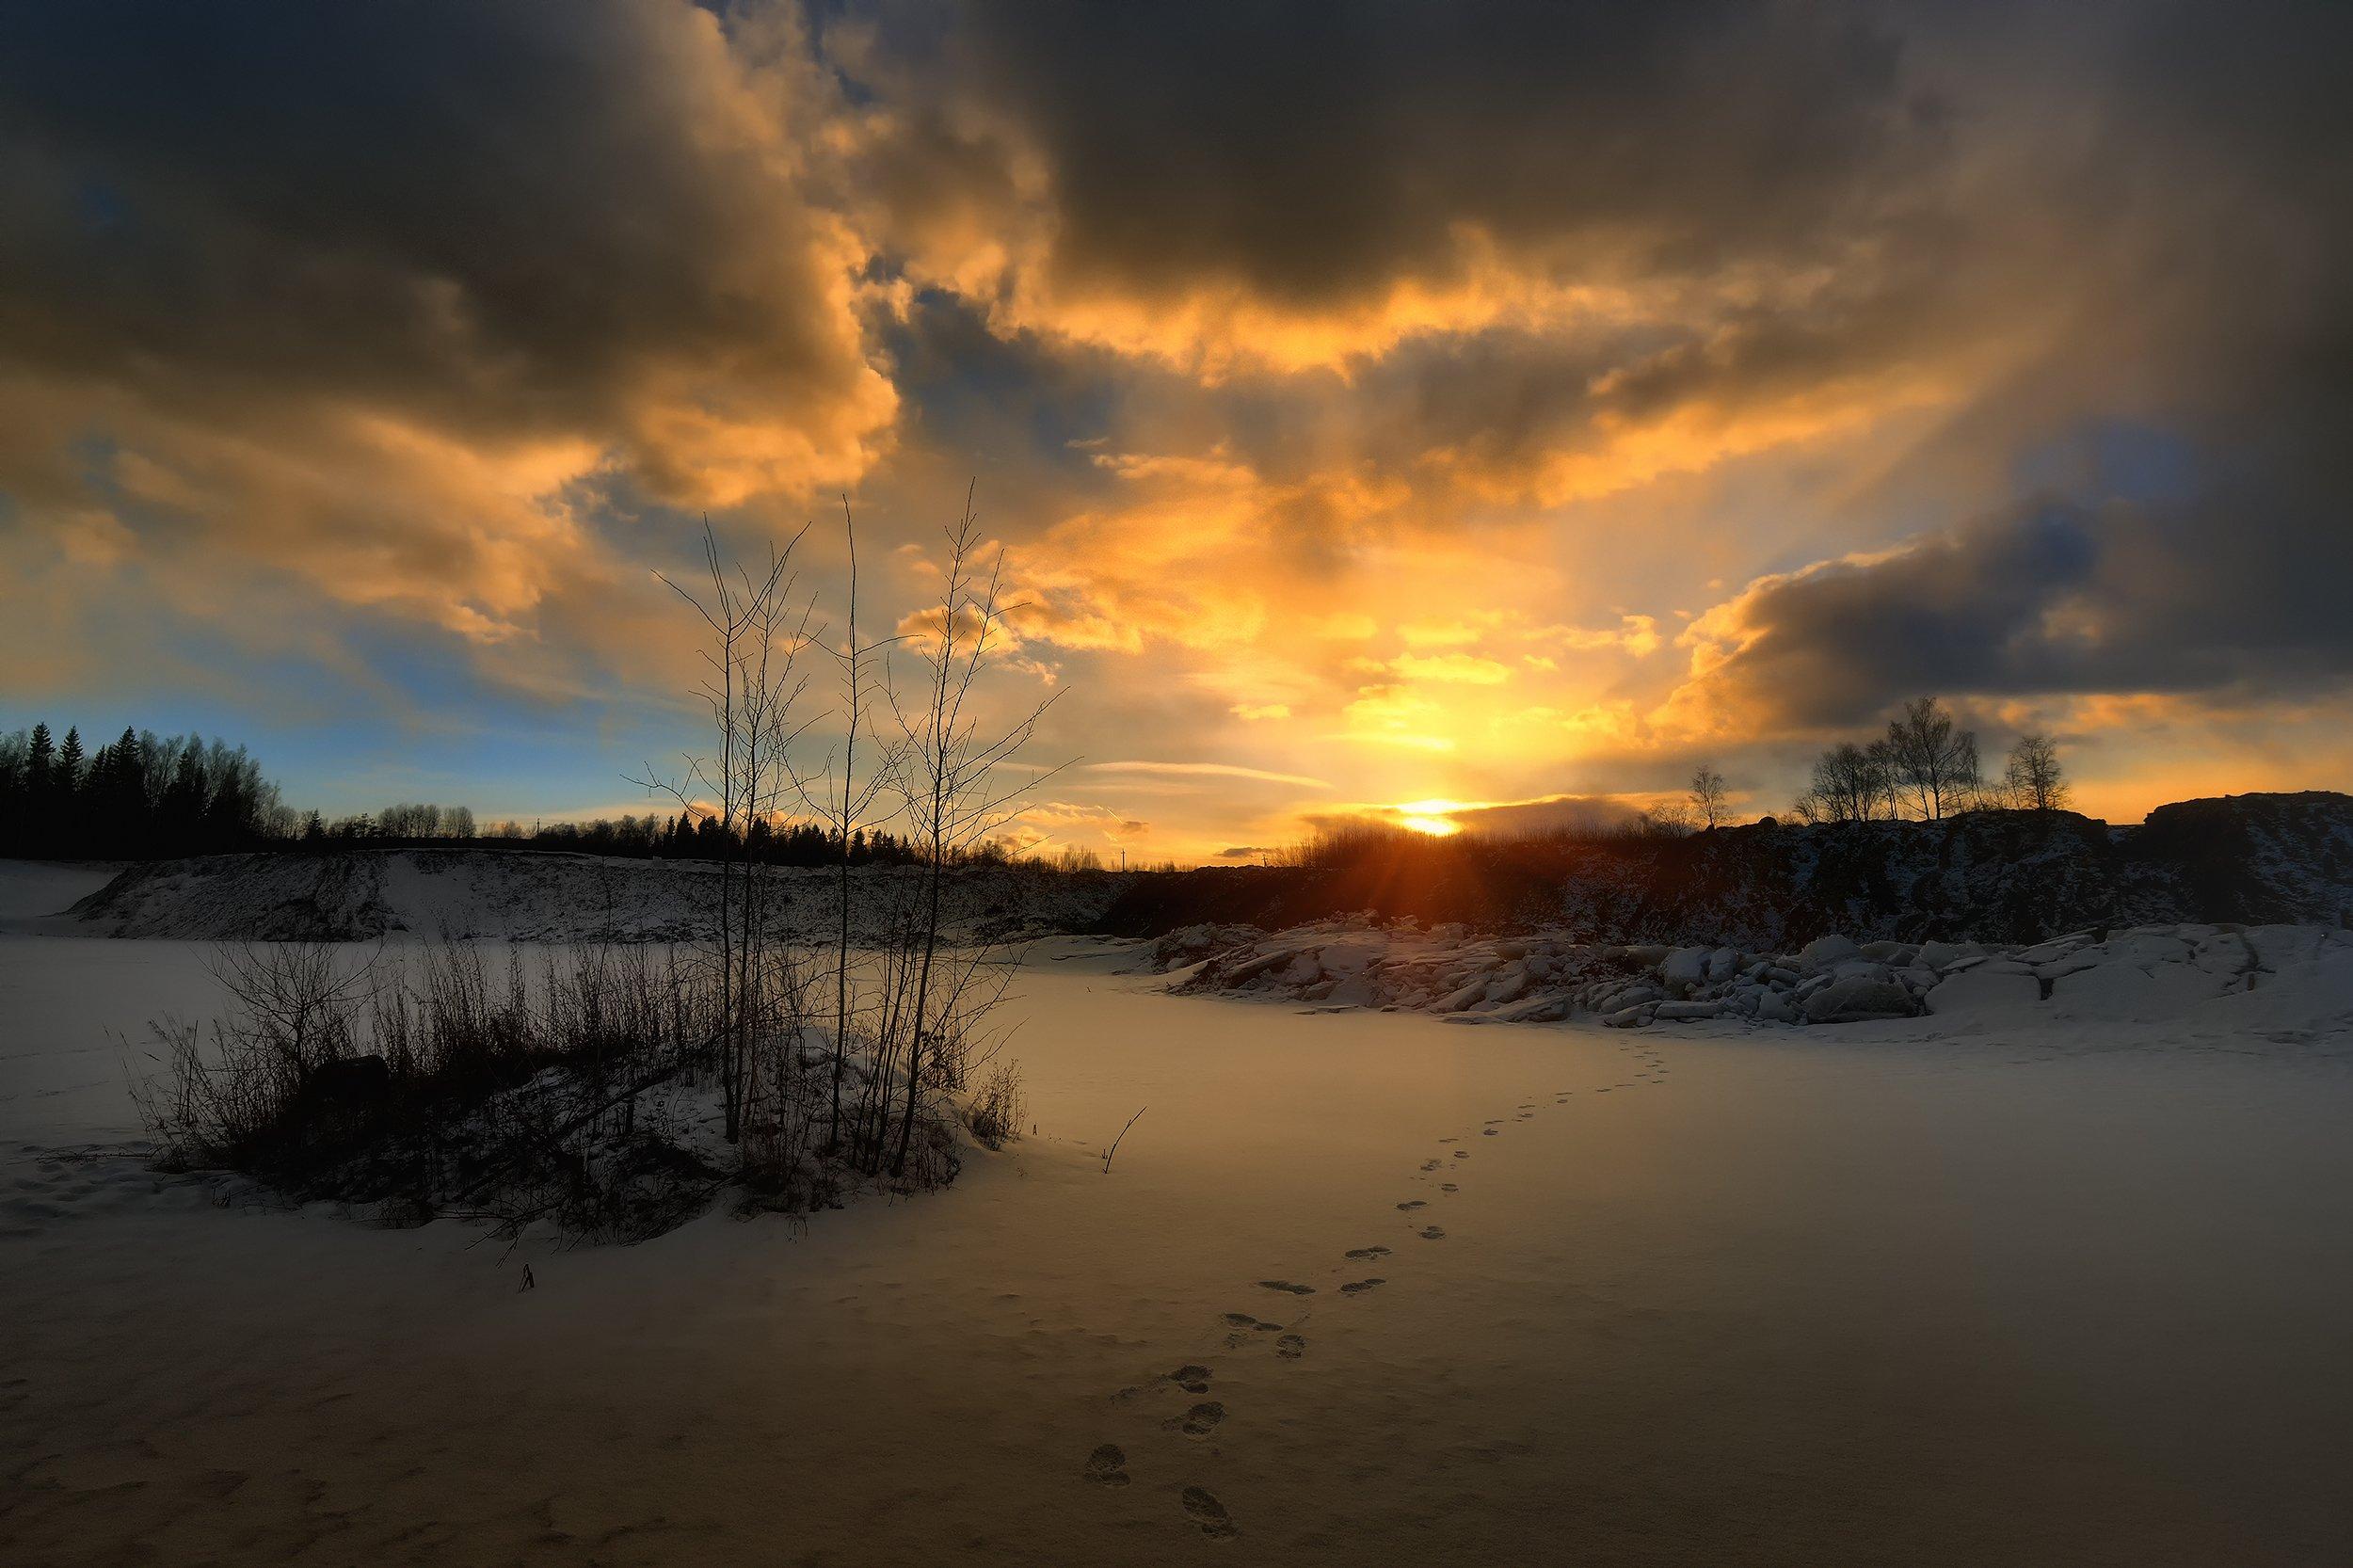 зима, winter, закат, вечер, снег, sunset, evening, snow, Алексей